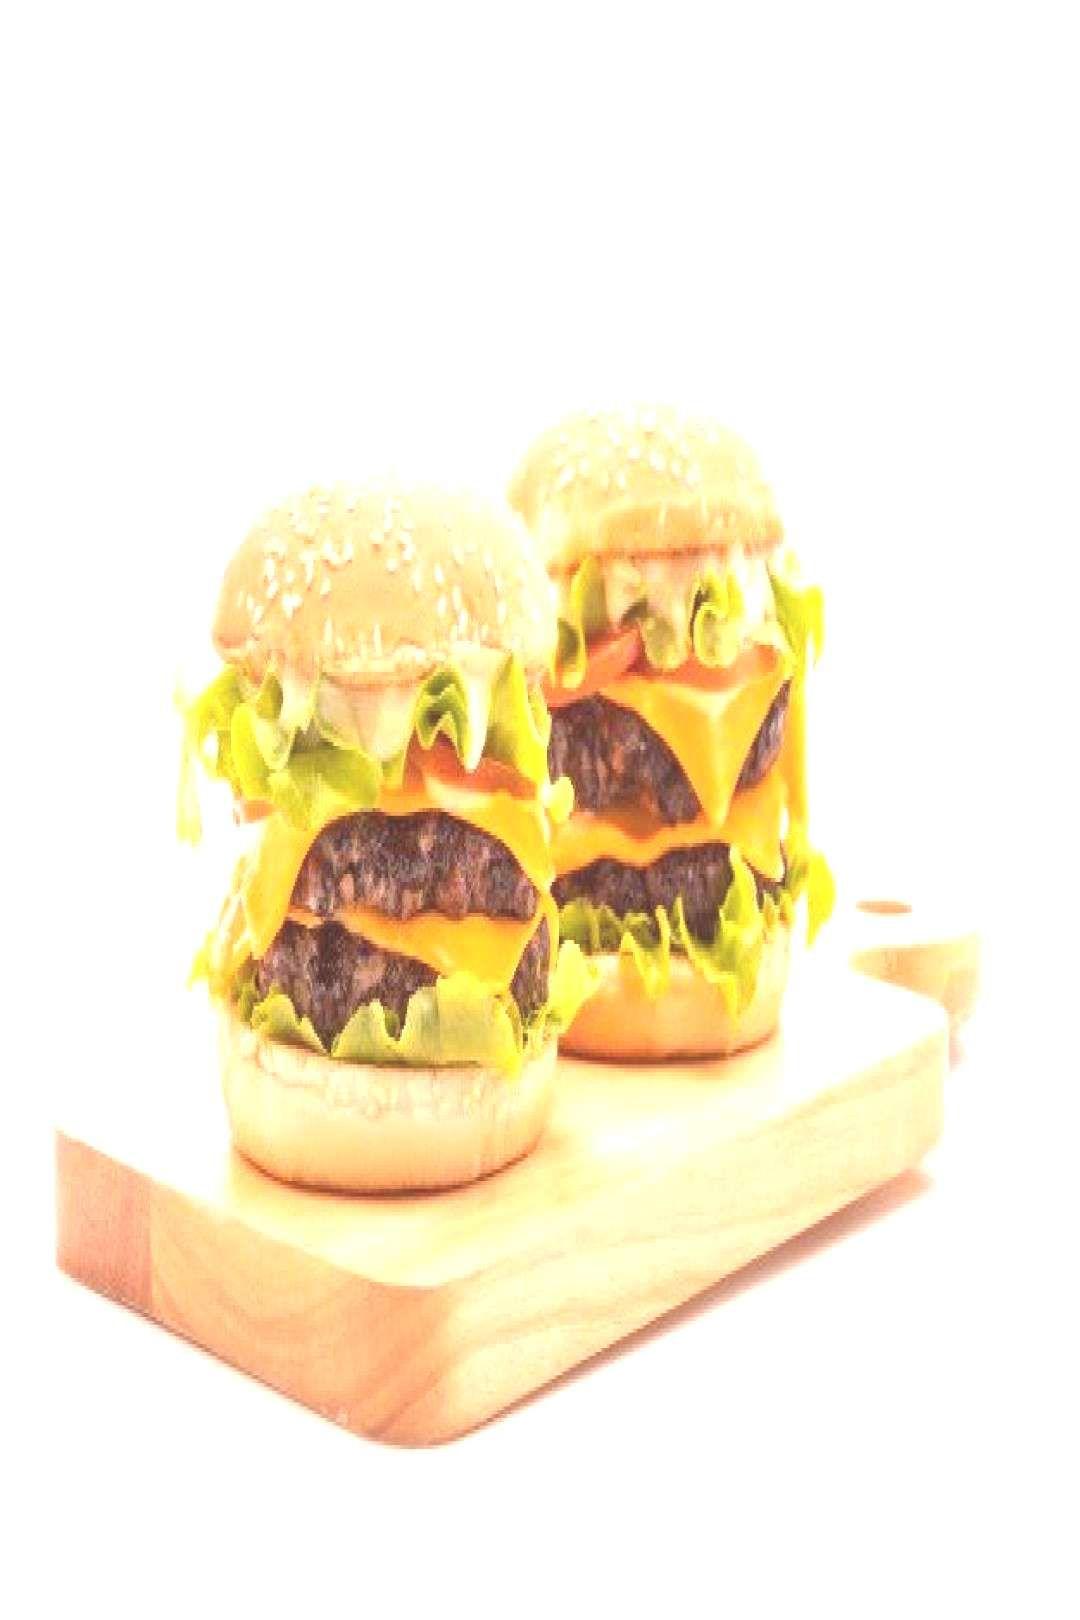 #websitehambrguer #restaurante #hambrguer #photoyou #alimento #saboroso #madeira #freepik #premium #saboros ...